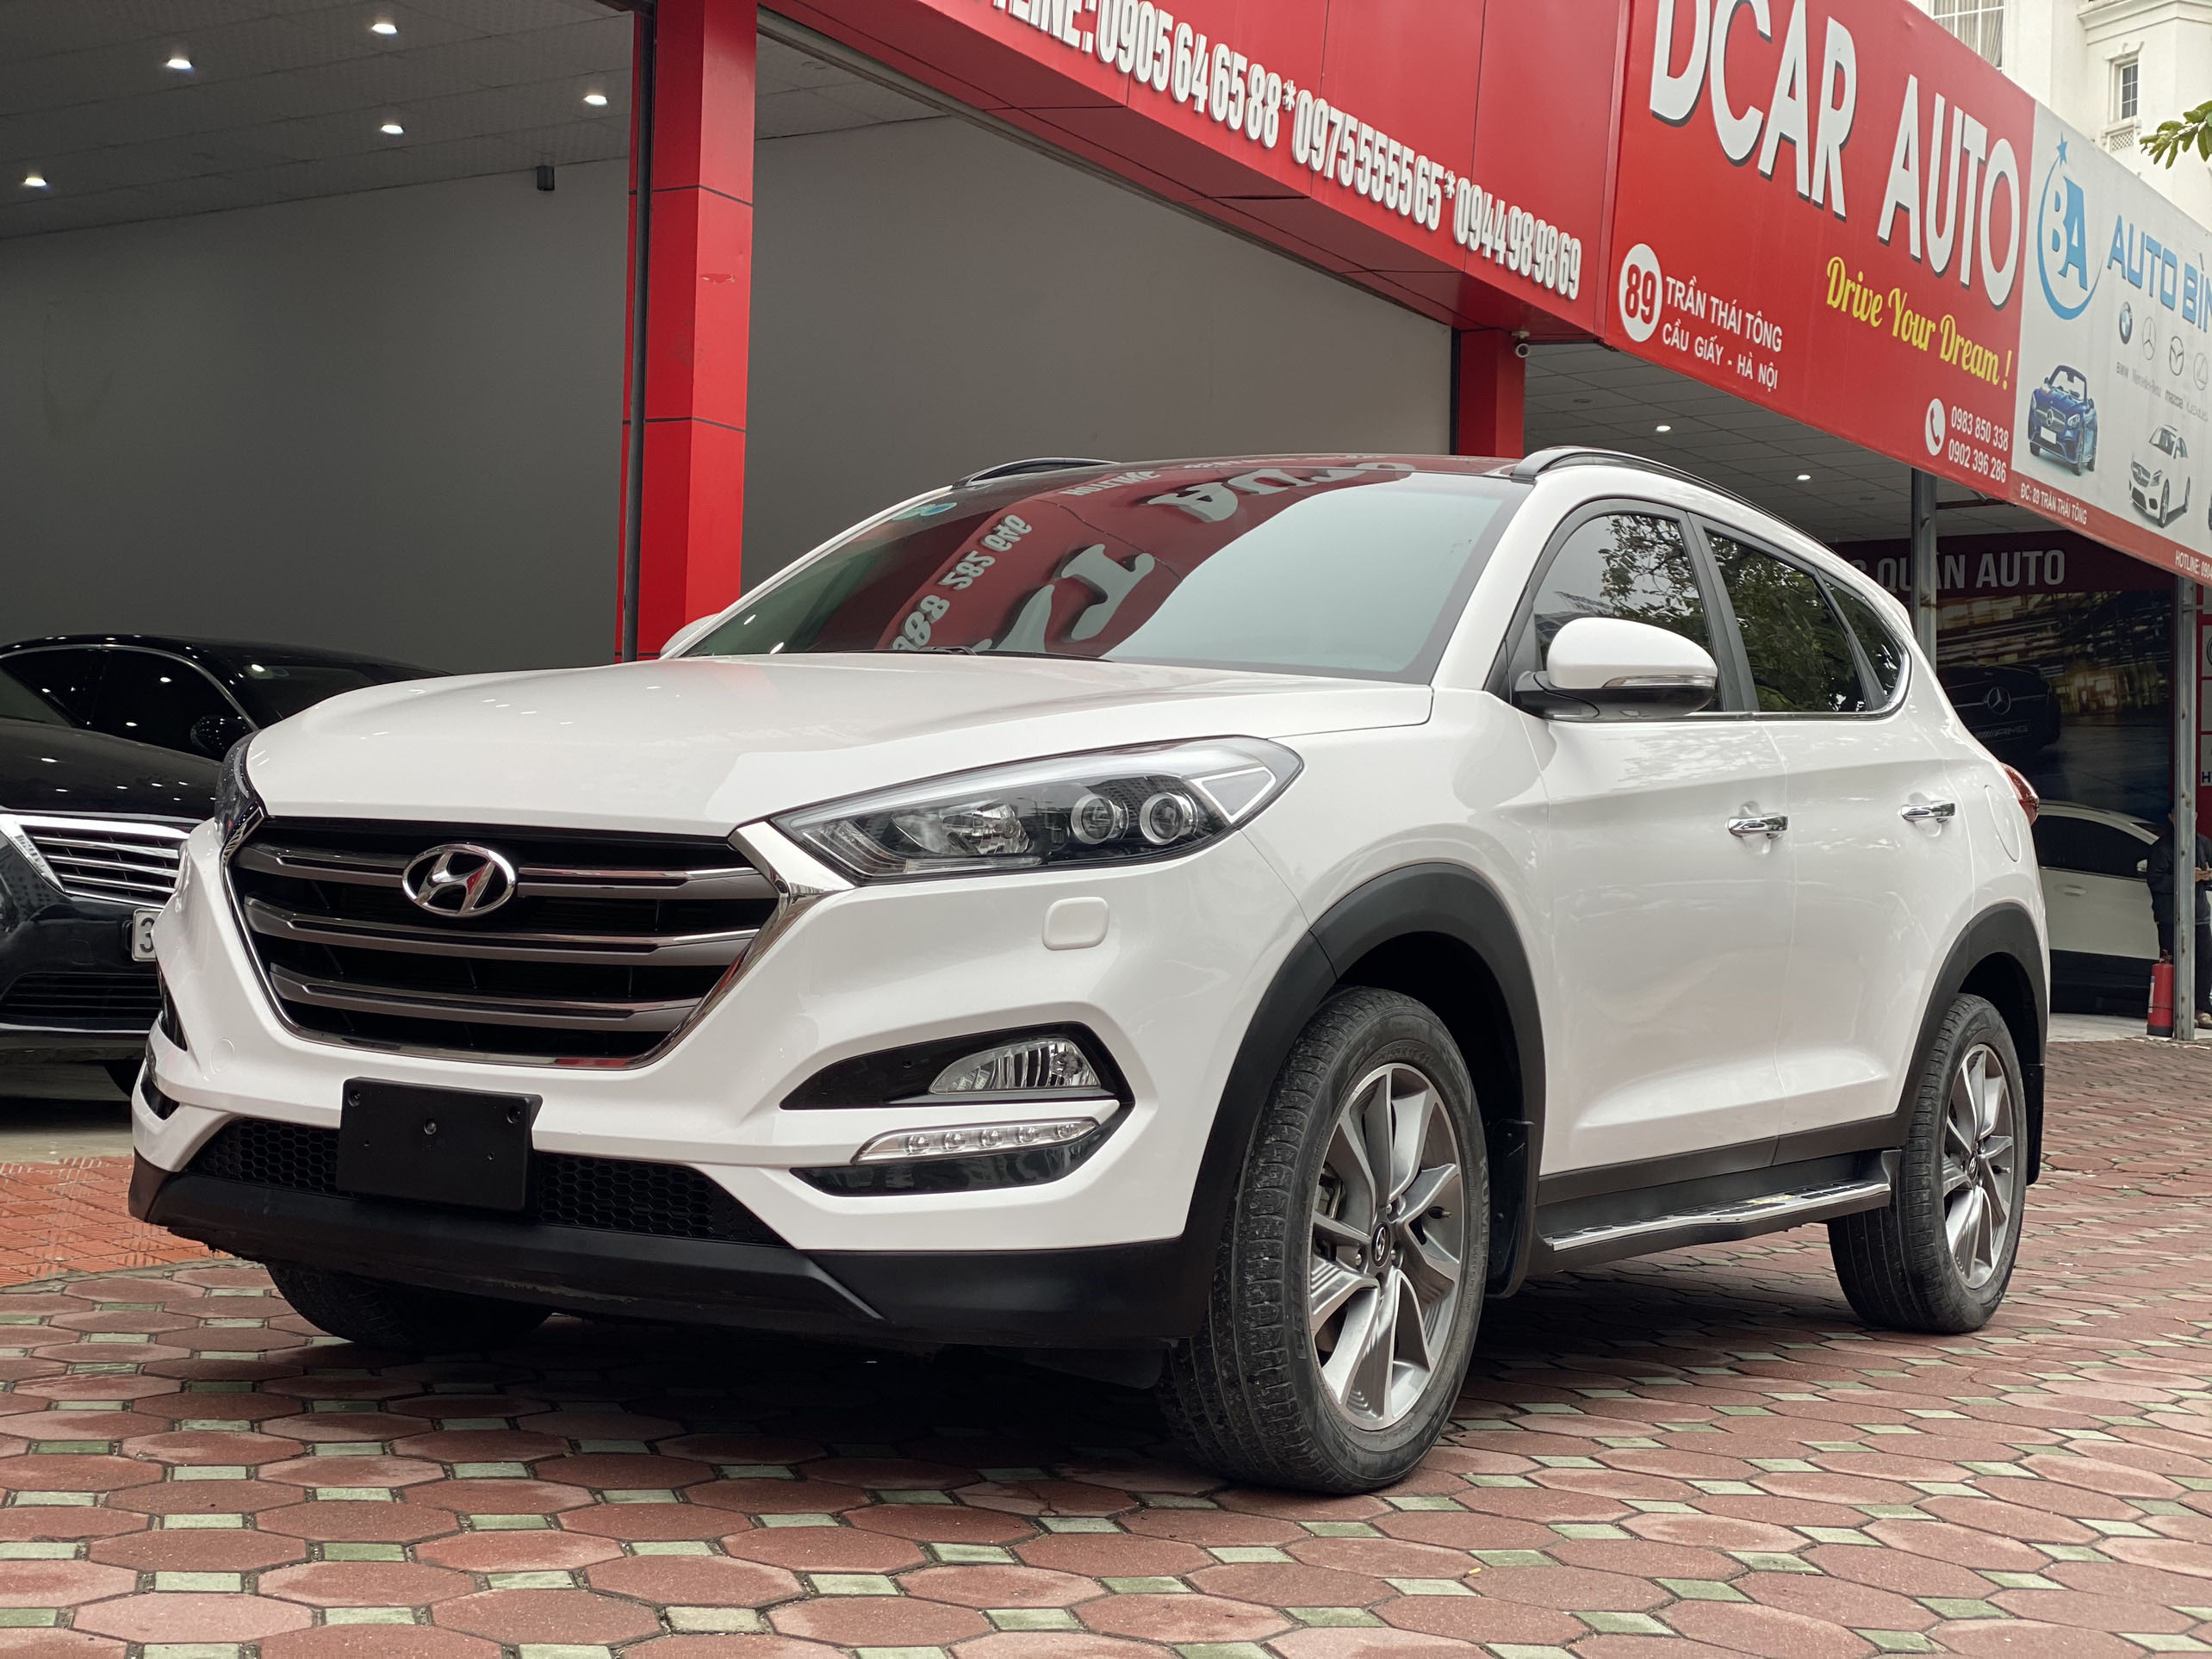 Hyundai Tucson 2.0 máy xăng 2018